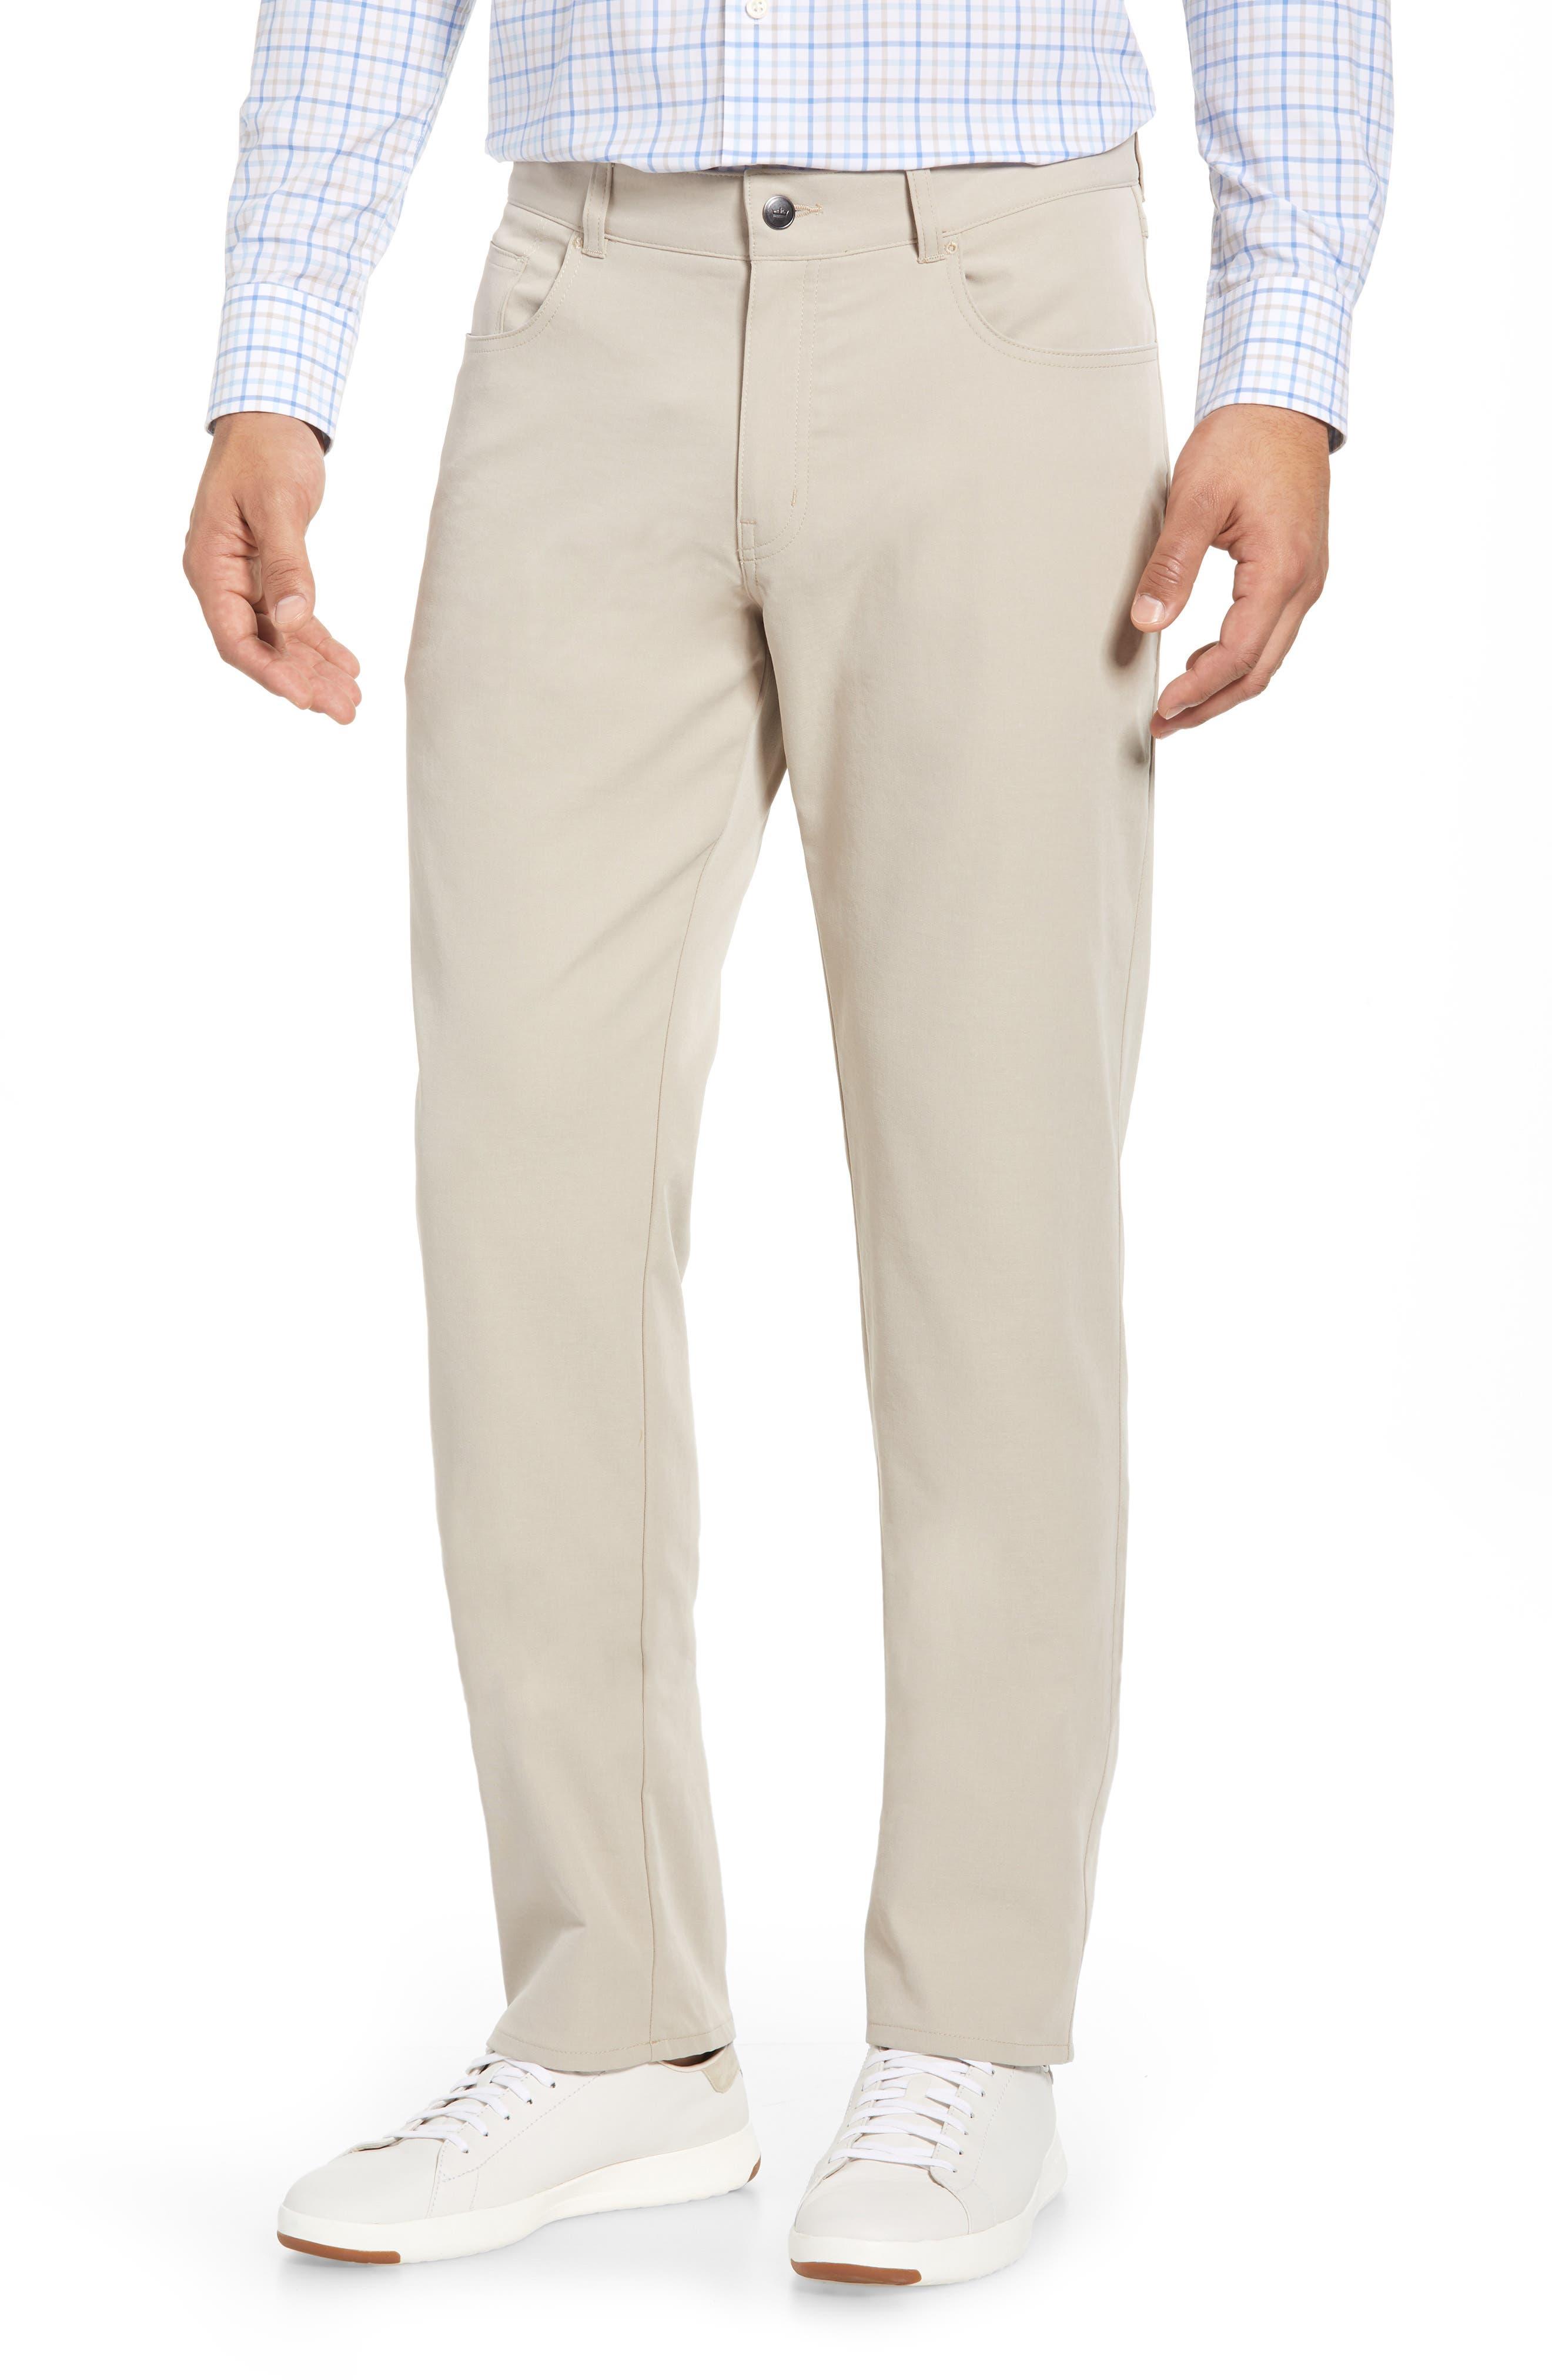 eb66 Regular Fit Performance Pants,                         Main,                         color, BEIGE